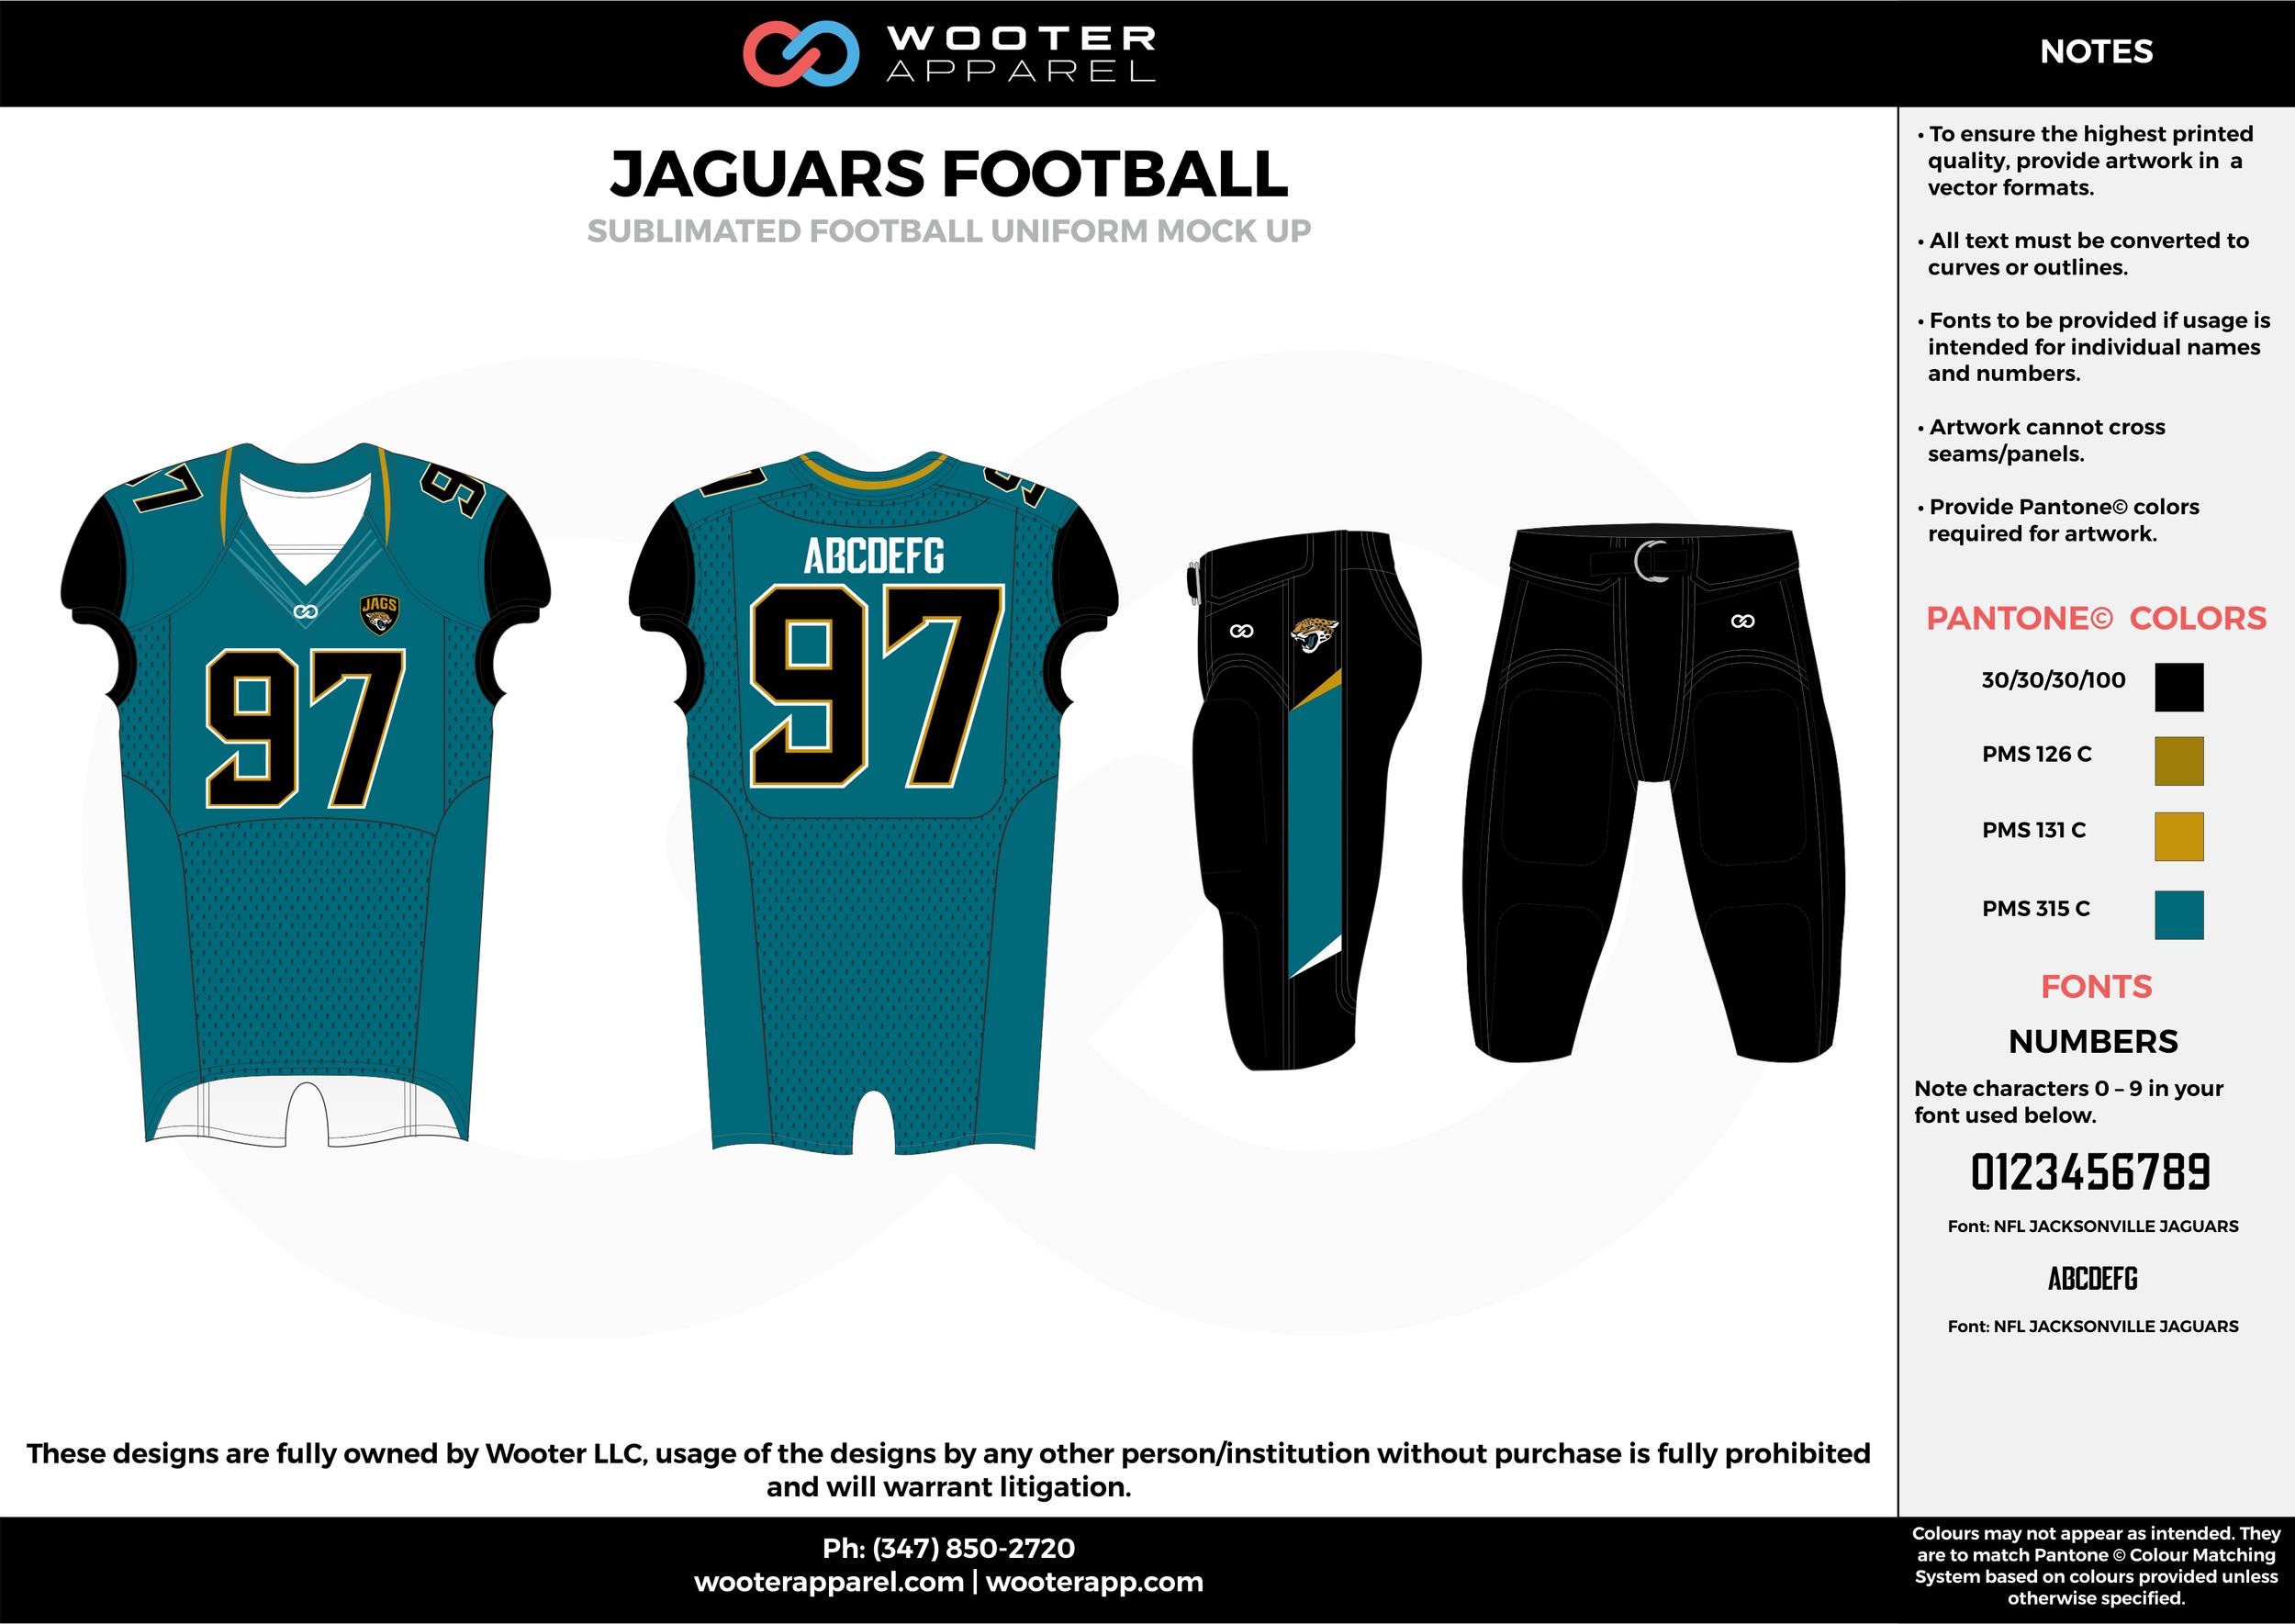 JAGUARS FOOTBALL water blue black yellow football uniforms jerseys pants